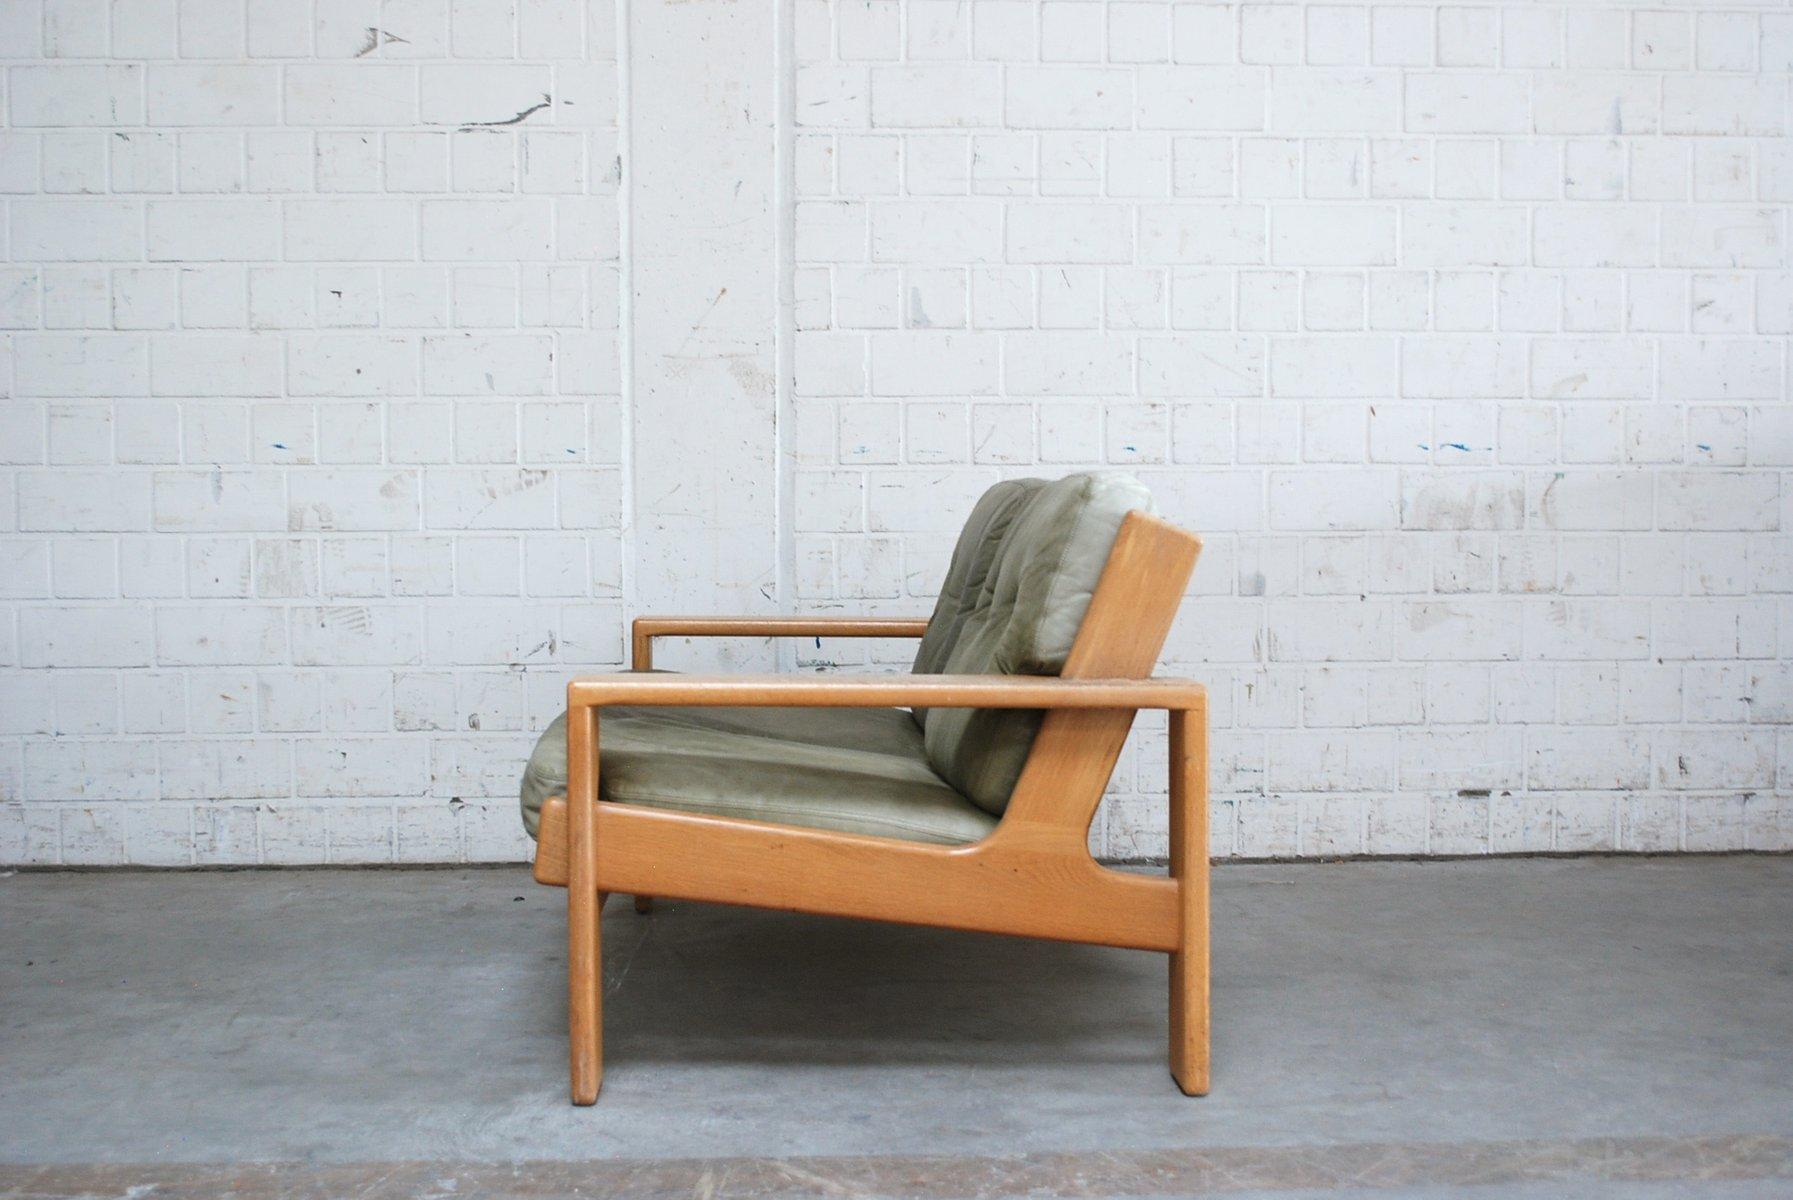 vintage bonanza green leather sofa by esko pajamies for asko for sale at pamono. Black Bedroom Furniture Sets. Home Design Ideas